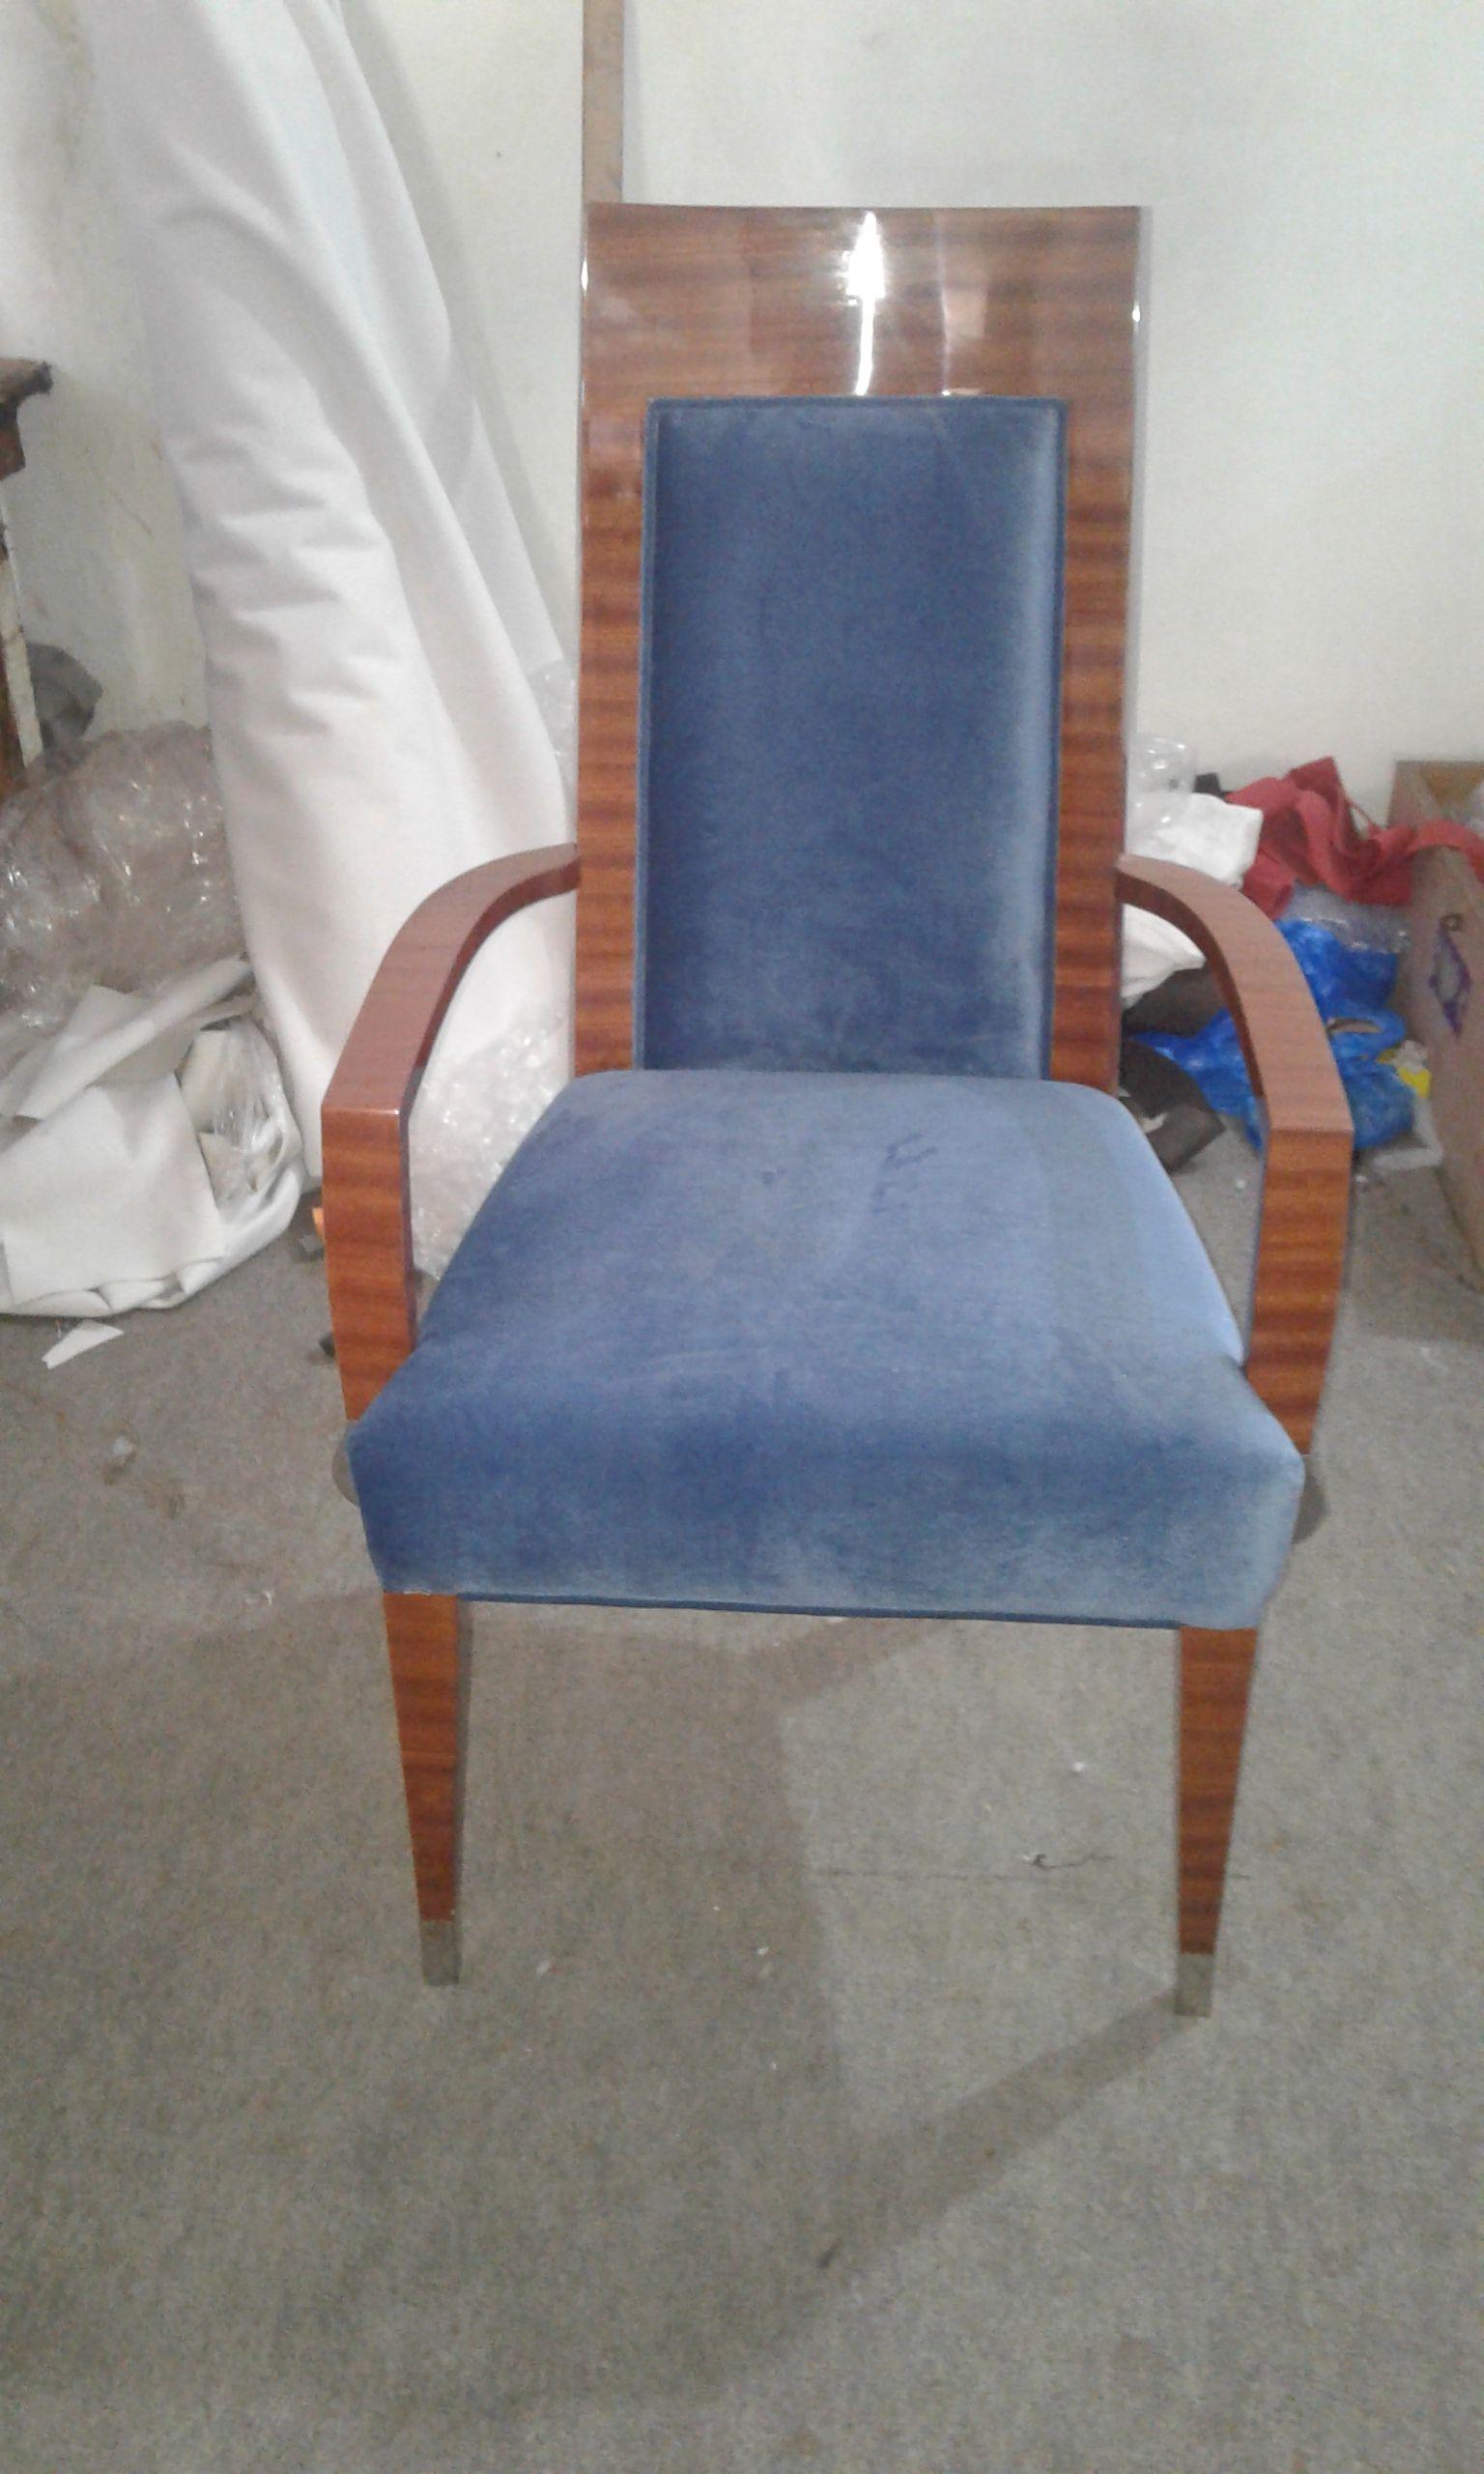 wooden armchair, chair shop near me, fiber chair, herman